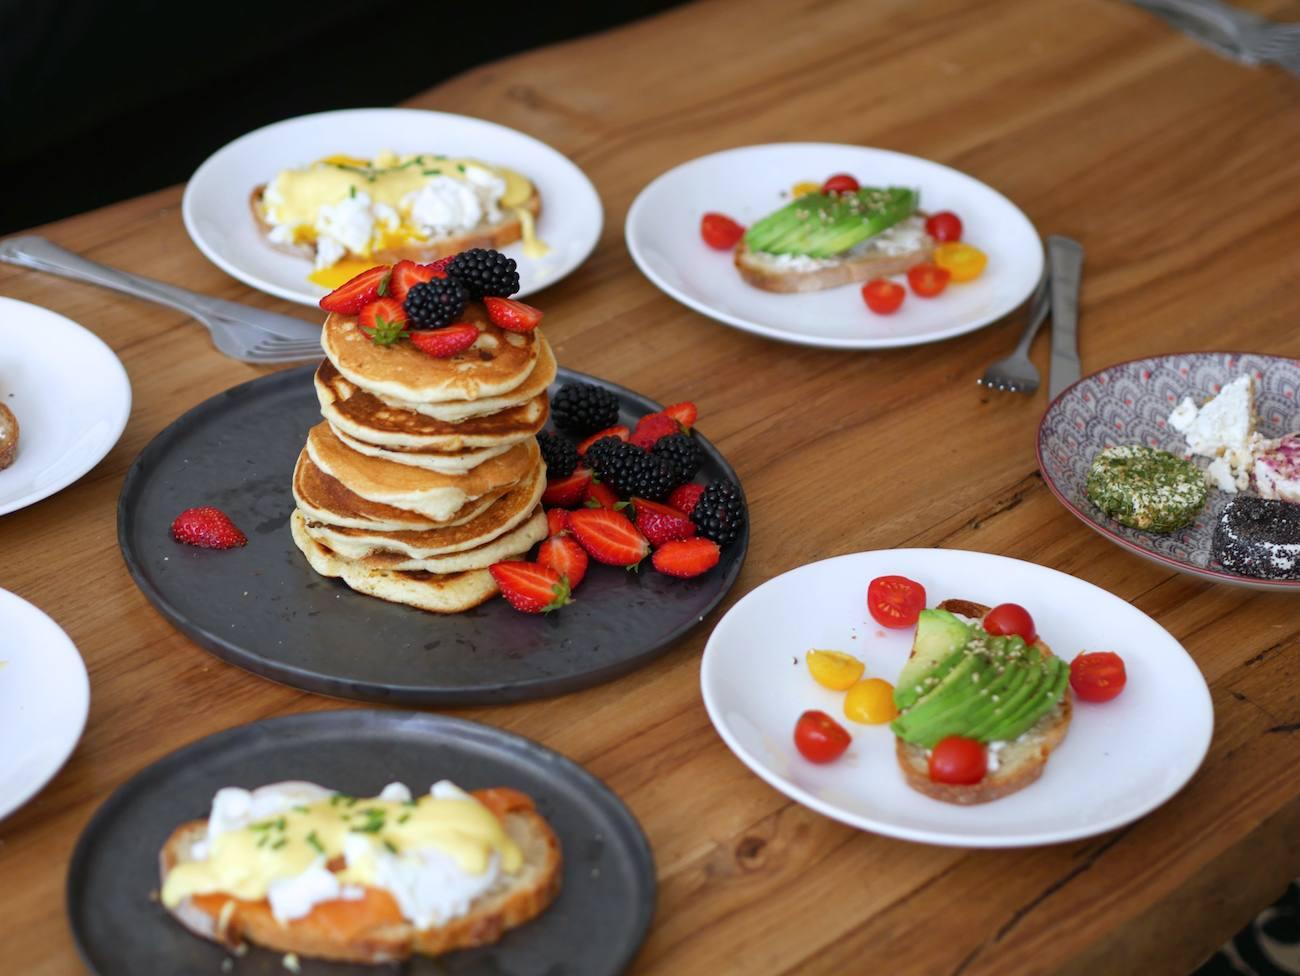 brunch-maison-recette-pancakes-toast-oeuf-benedicte-infuz-2